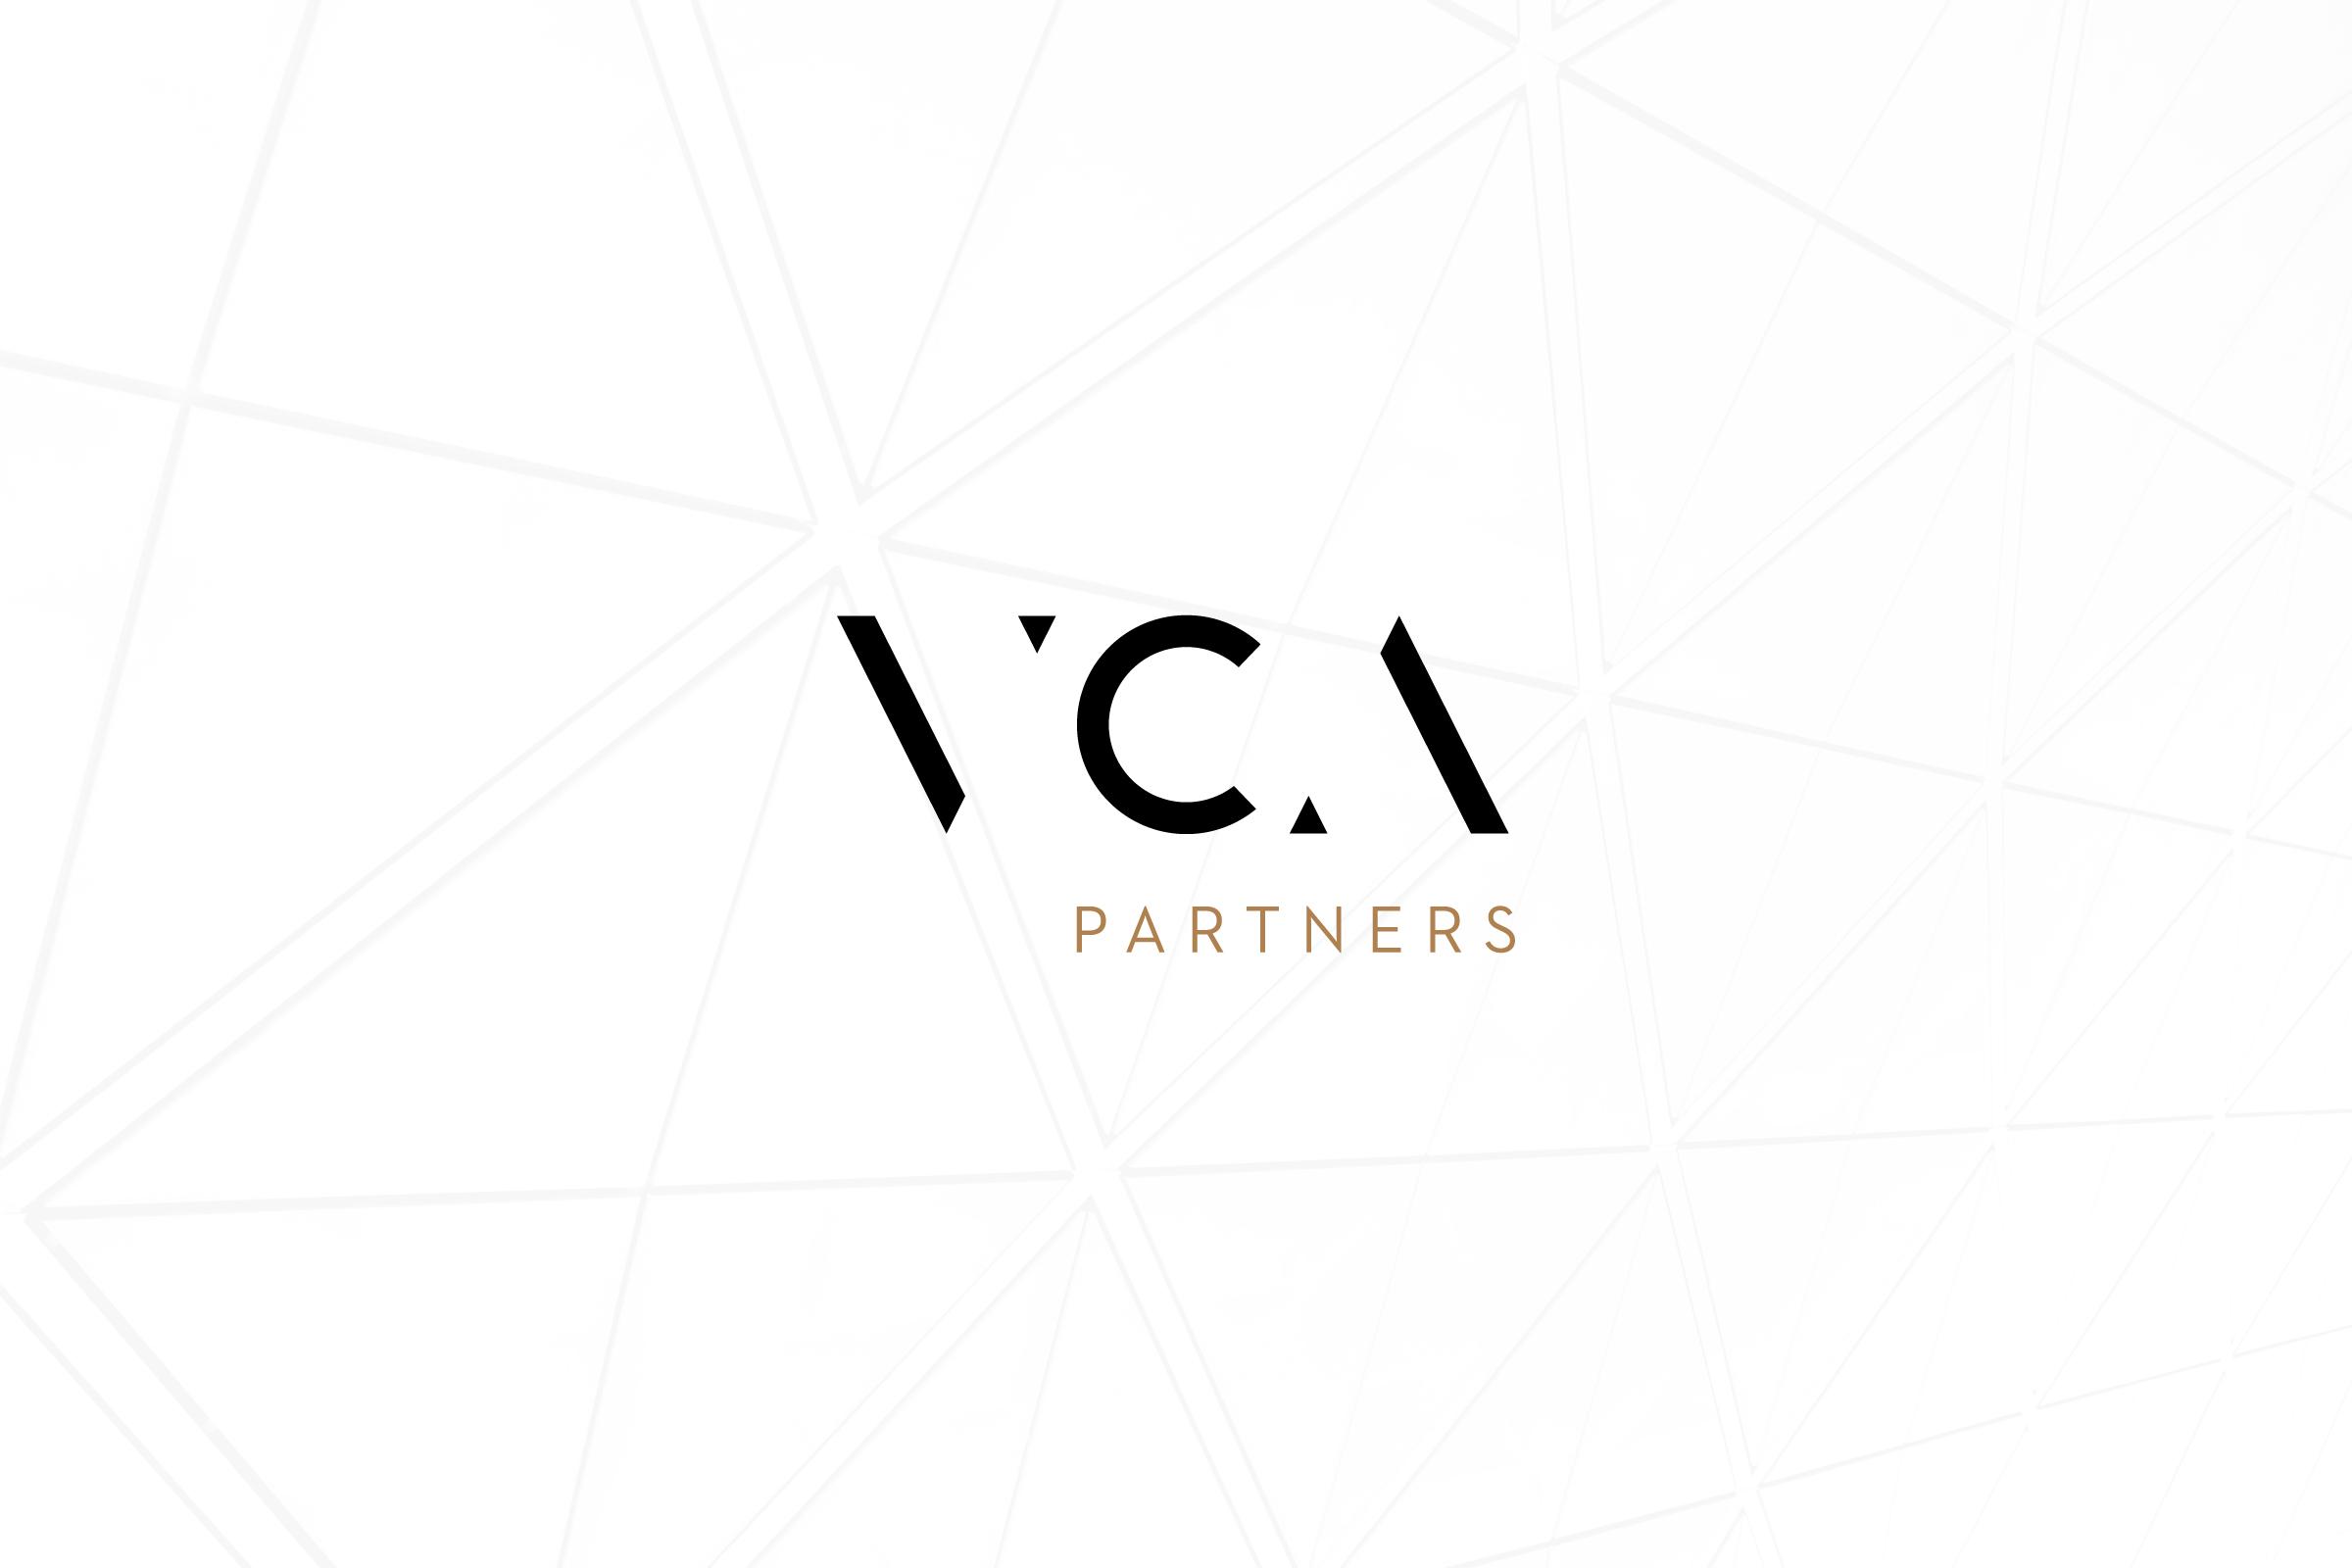 VCA-Mockups-01